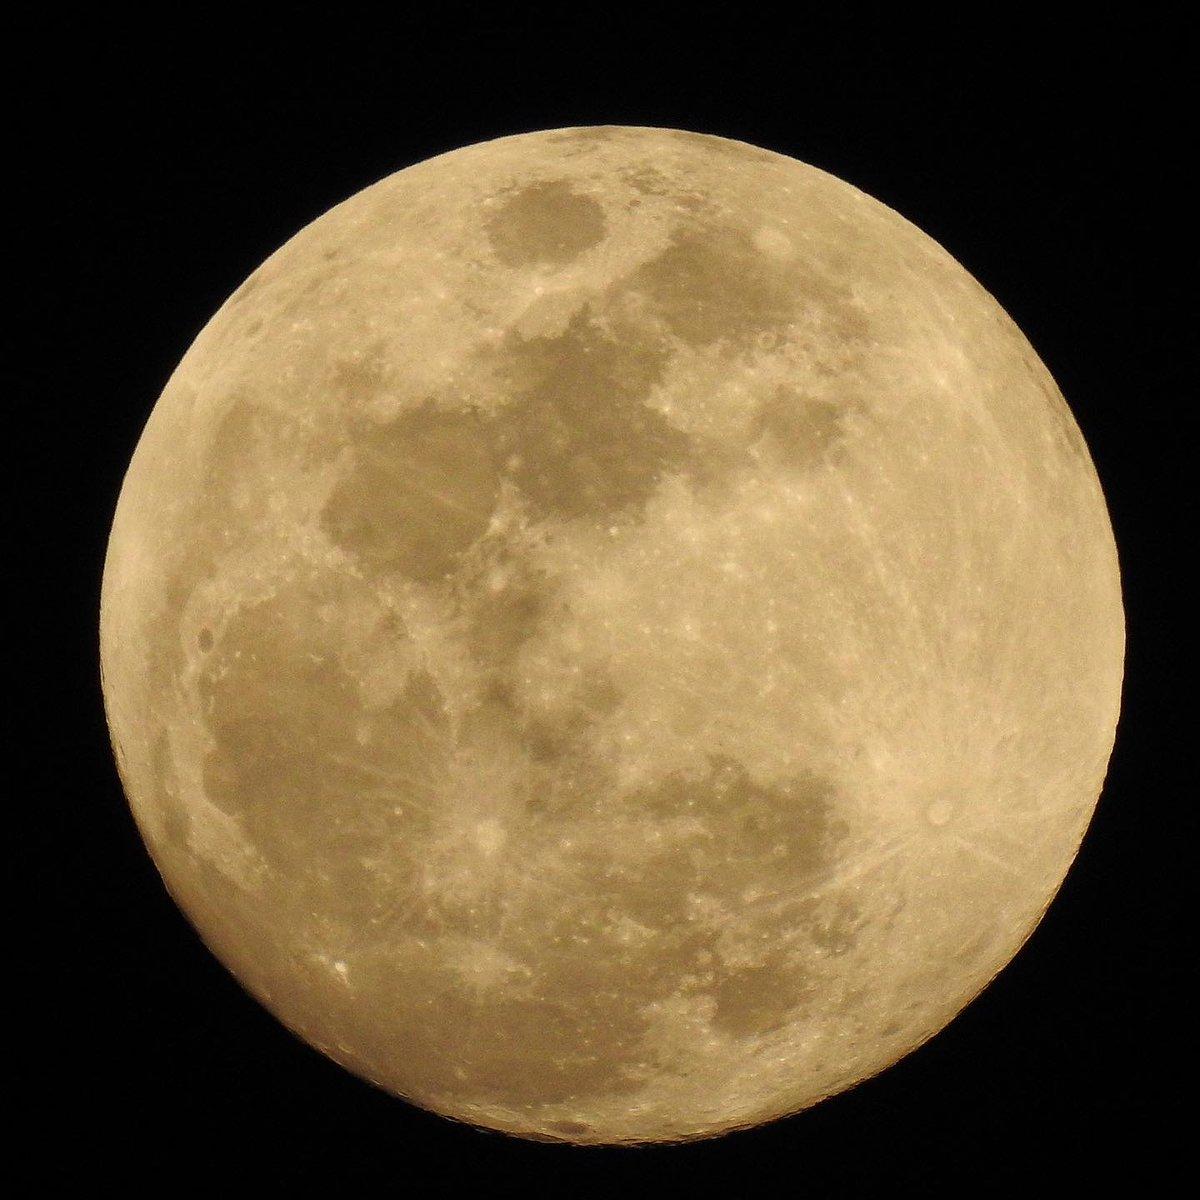 Bulannya cantik banget malam ini, ya. https://t.co/8JxLyNyO1b